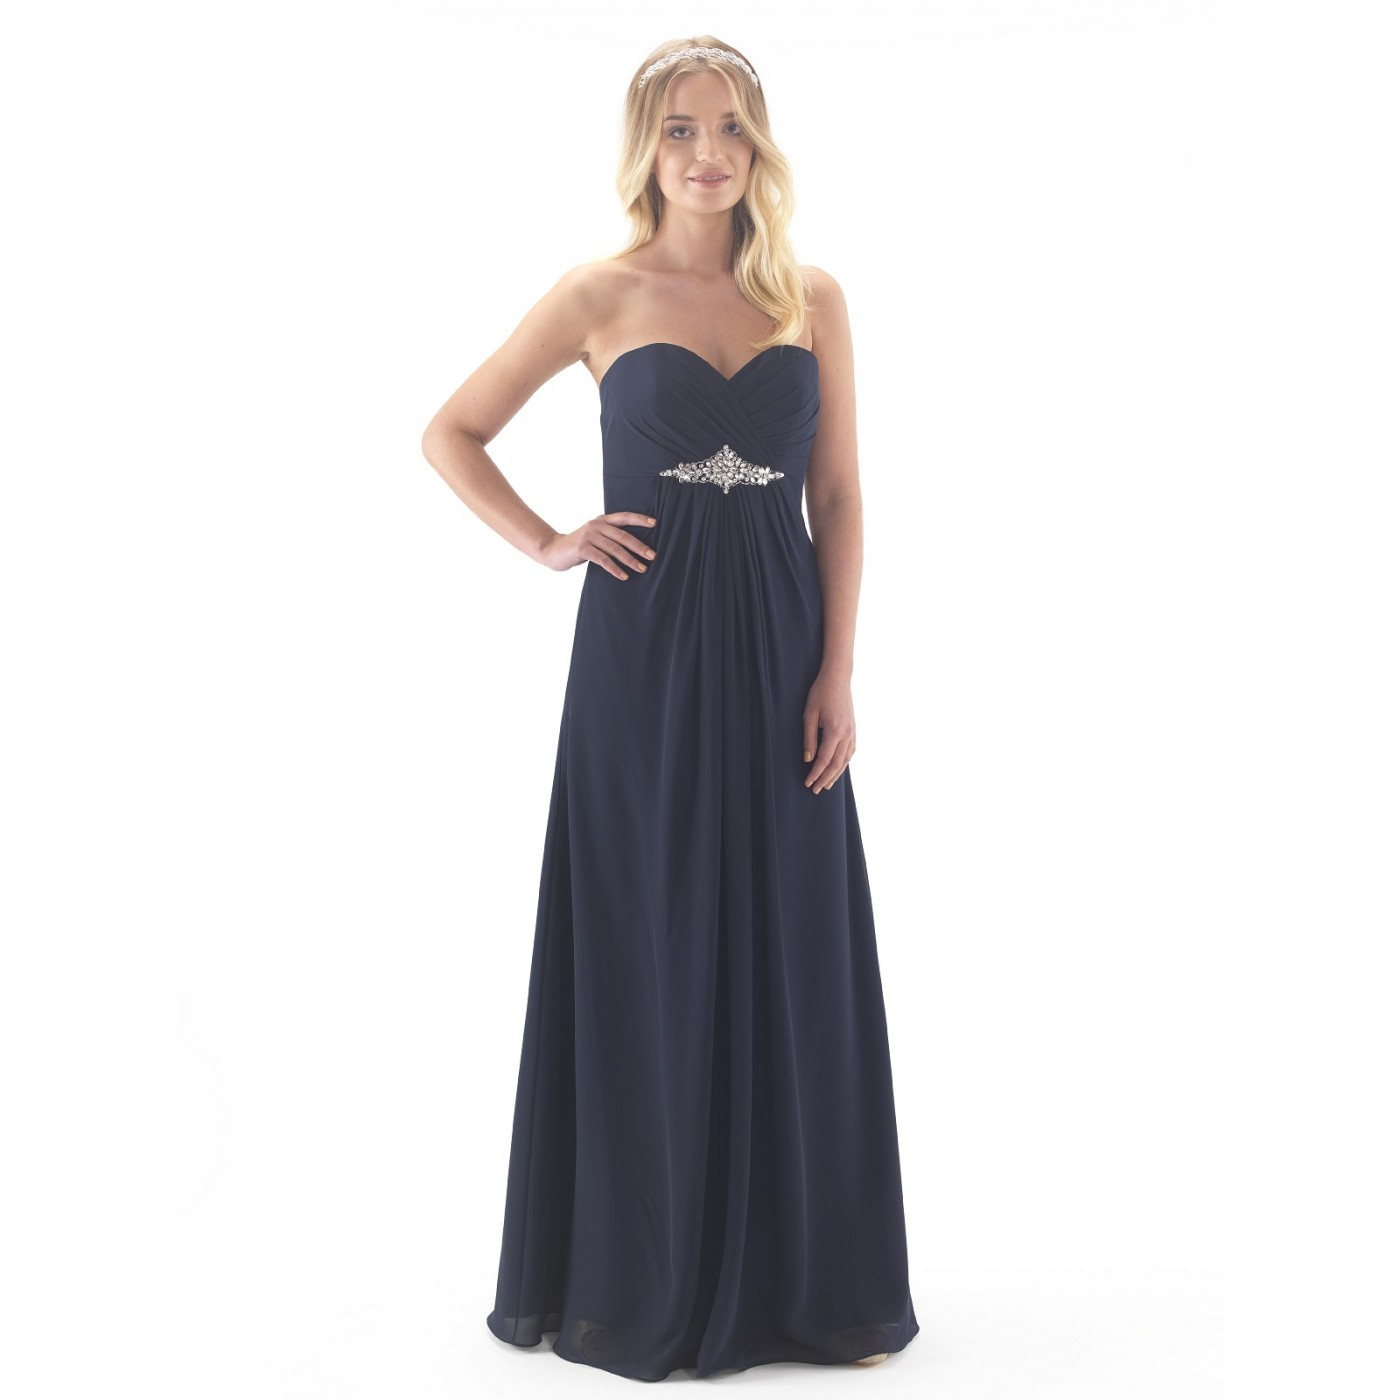 linzi-jay-empire-line-chiffon-bridesmaid-dress-en388-front-1400x1400